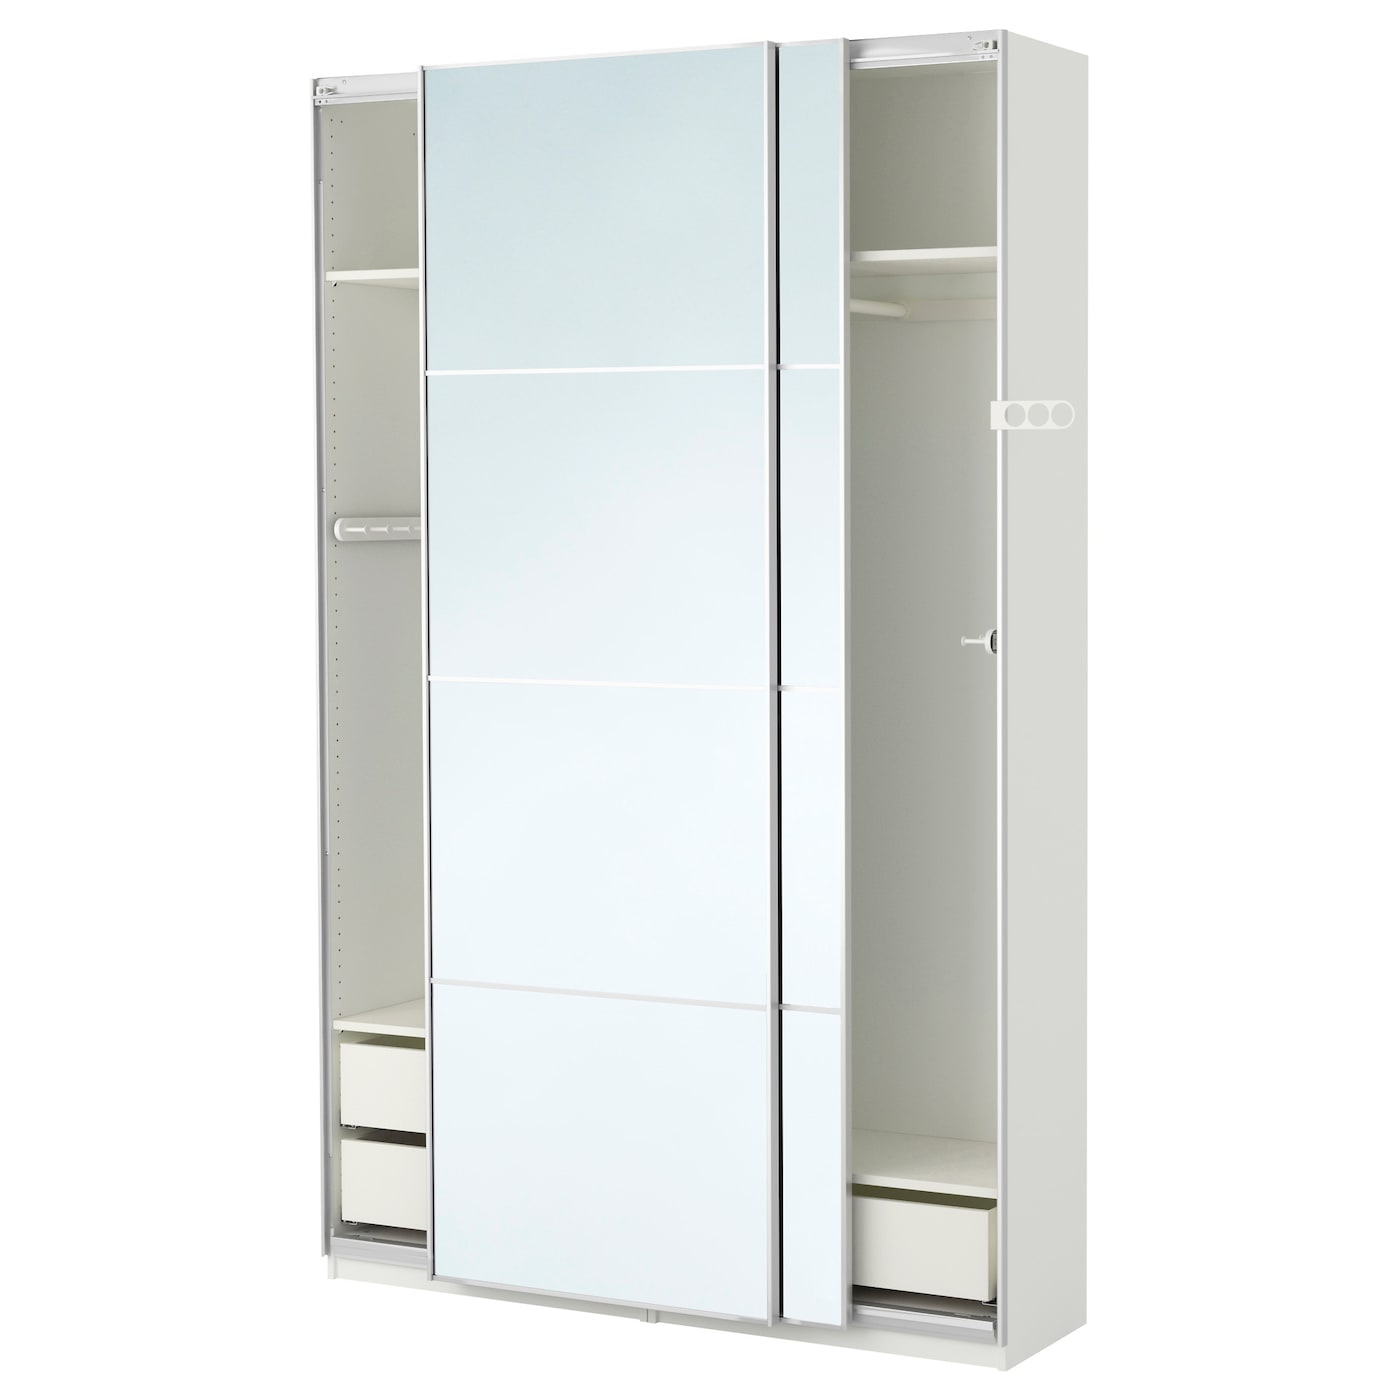 pax wardrobe white auli mirror glass 150 x 44 x 236 cm ikea. Black Bedroom Furniture Sets. Home Design Ideas